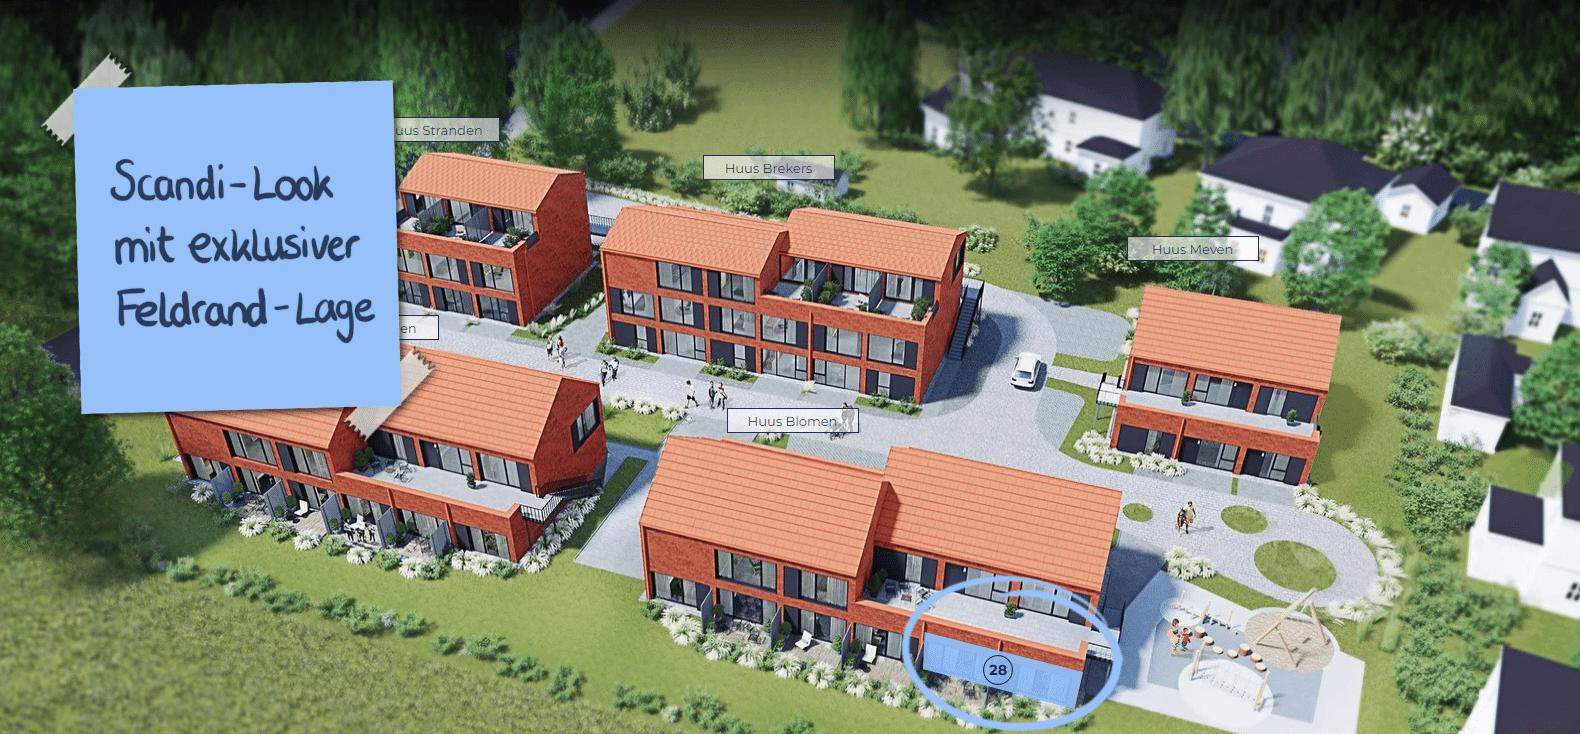 28_De ole School - Ostseeurlaub Ferienapartments Hohwacht Nähe Heiligenhafen Lütjenburg Kieler Bucht